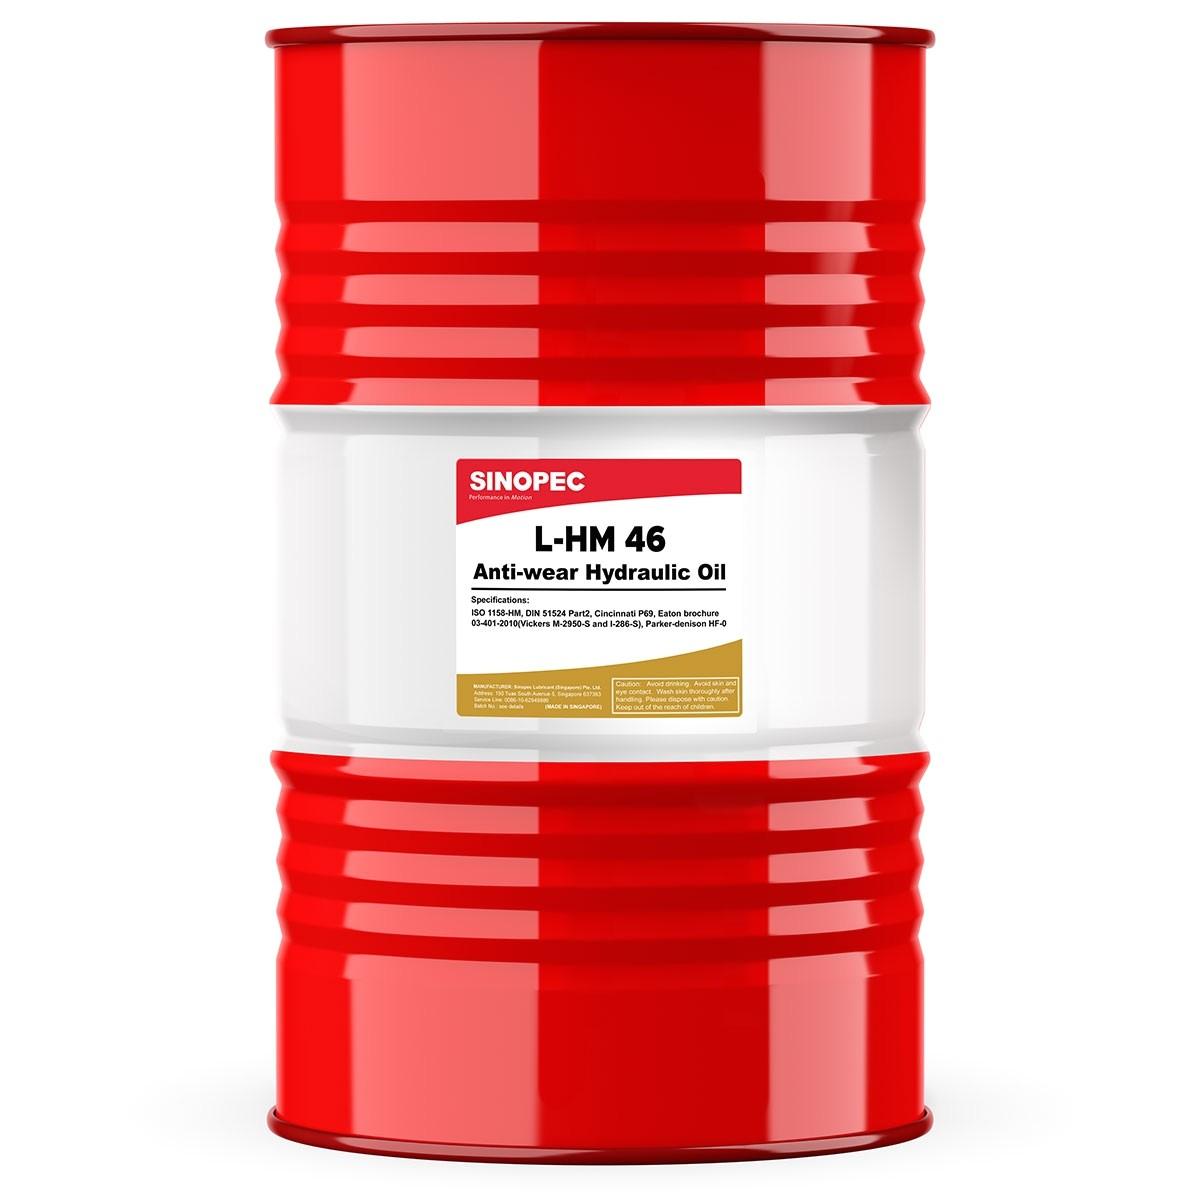 Windshield Washer Fluid 55 Gal Drum Aw 46 Hydraulic Oil Fluid iso Vg 46 Sae 15w 55 Gallon Drum